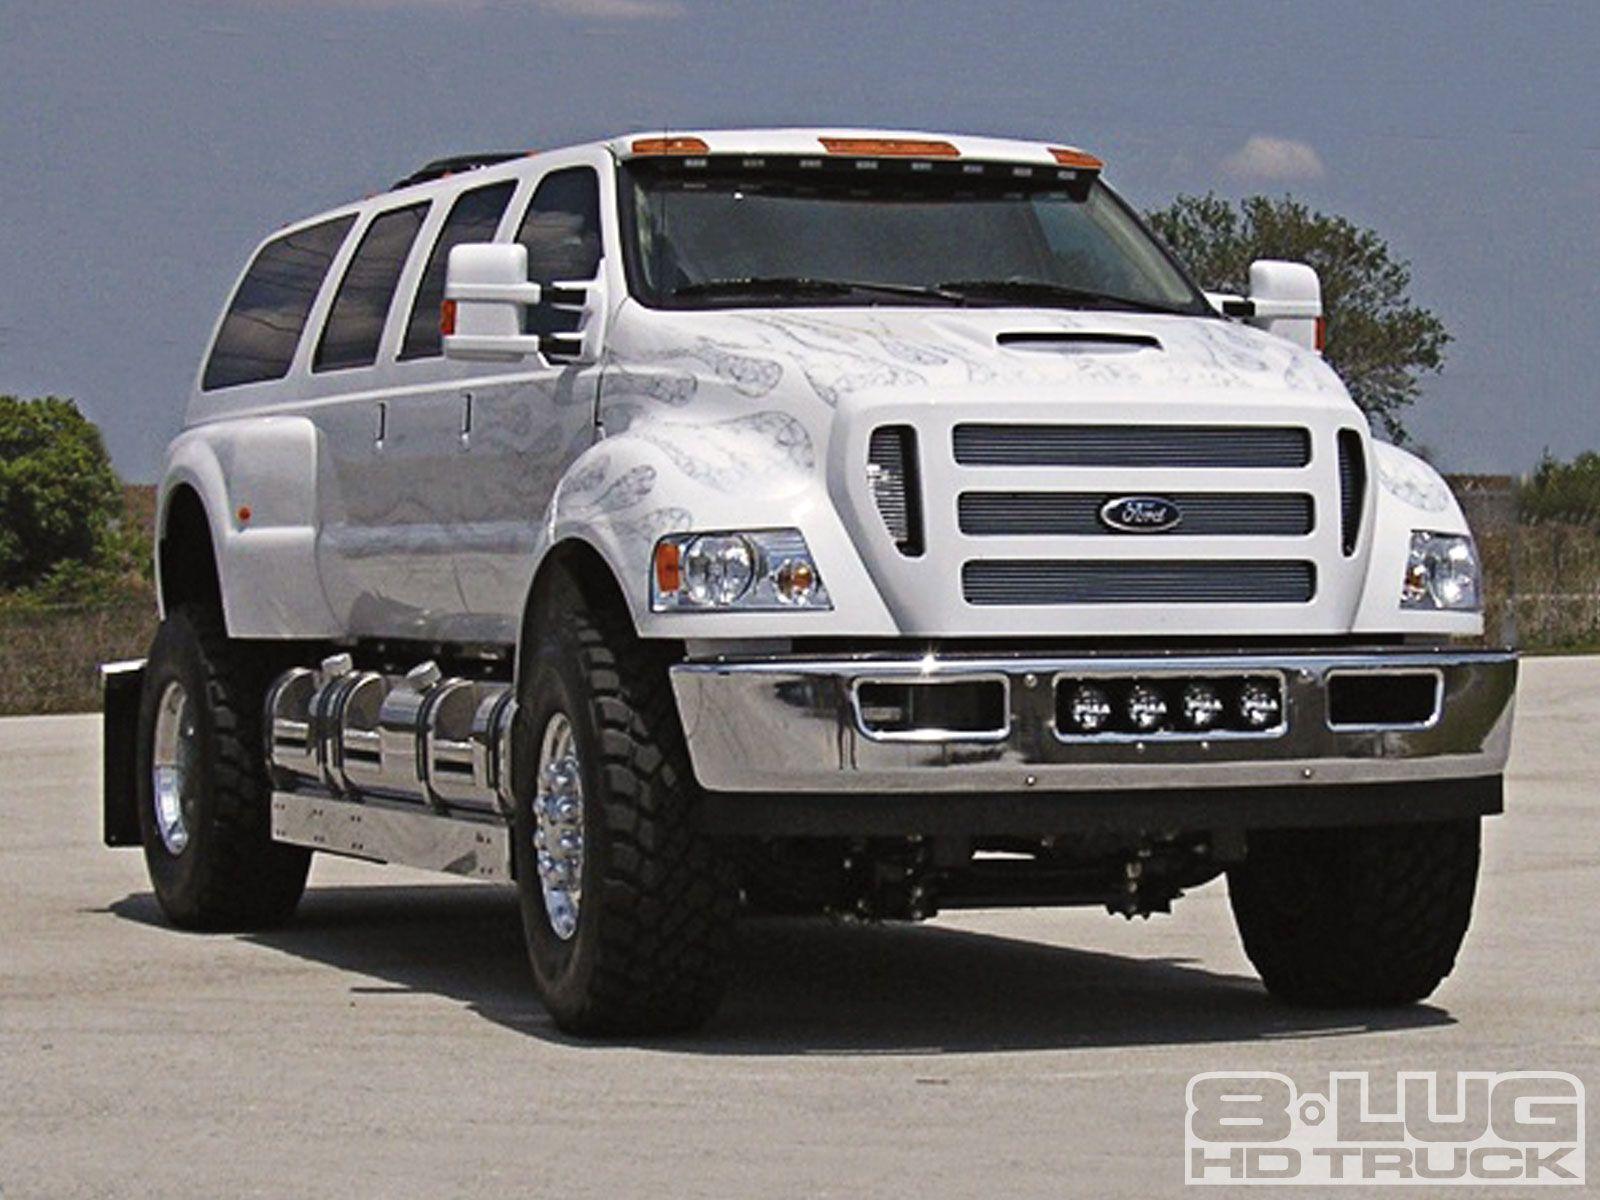 Ford F650 HD Wallpaper Background Diesel trucks, Diesel